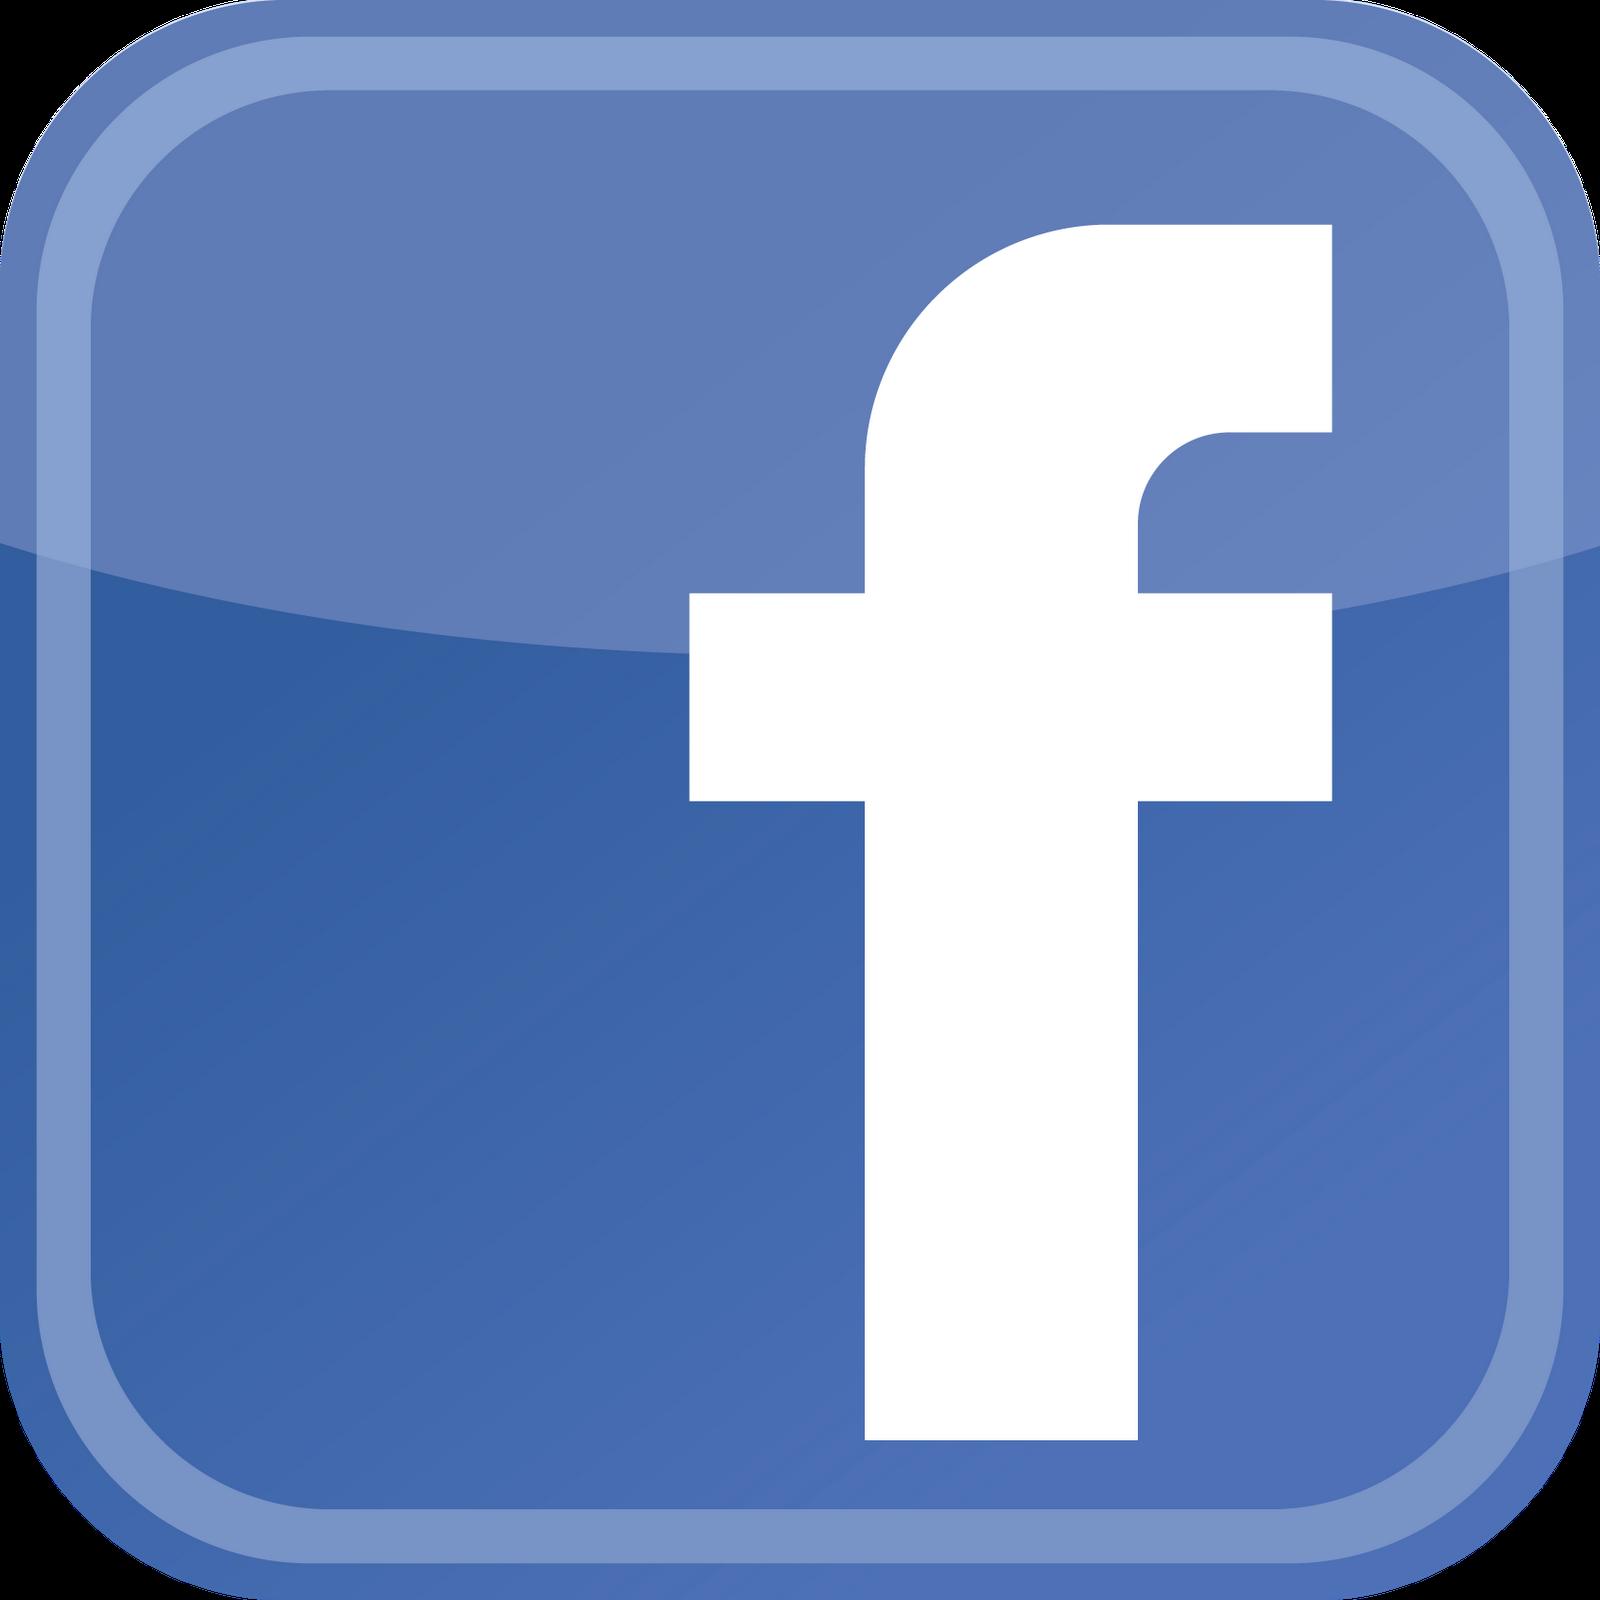 Stonejinns sur Facebook